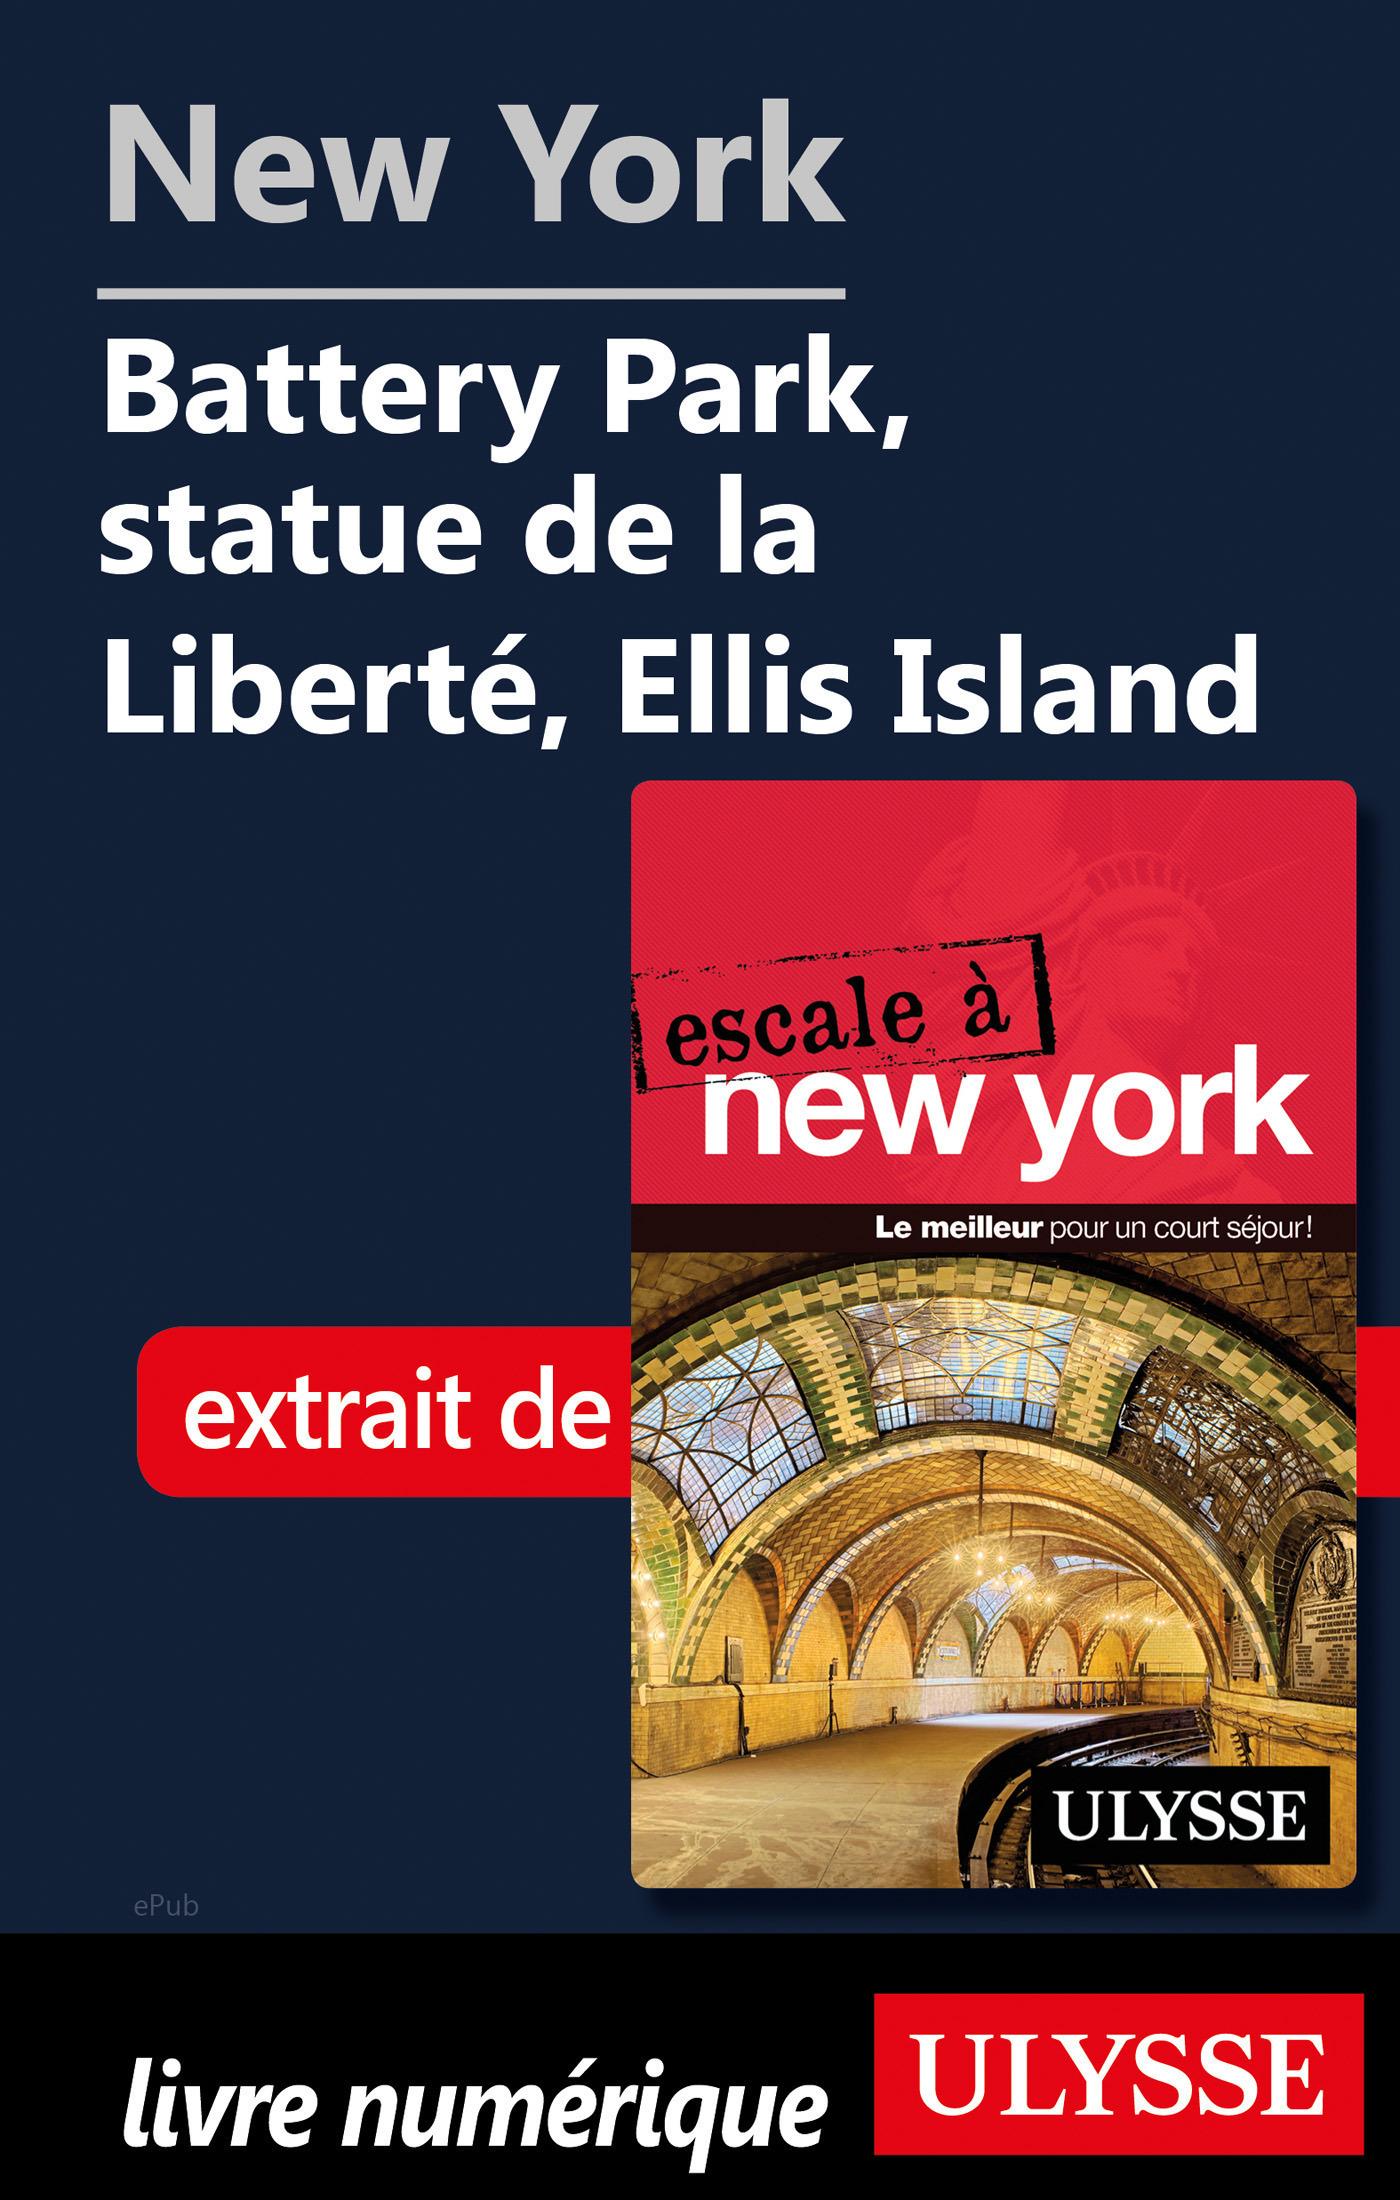 New York - Battery Park, statue de la Liberté, Ellis Island